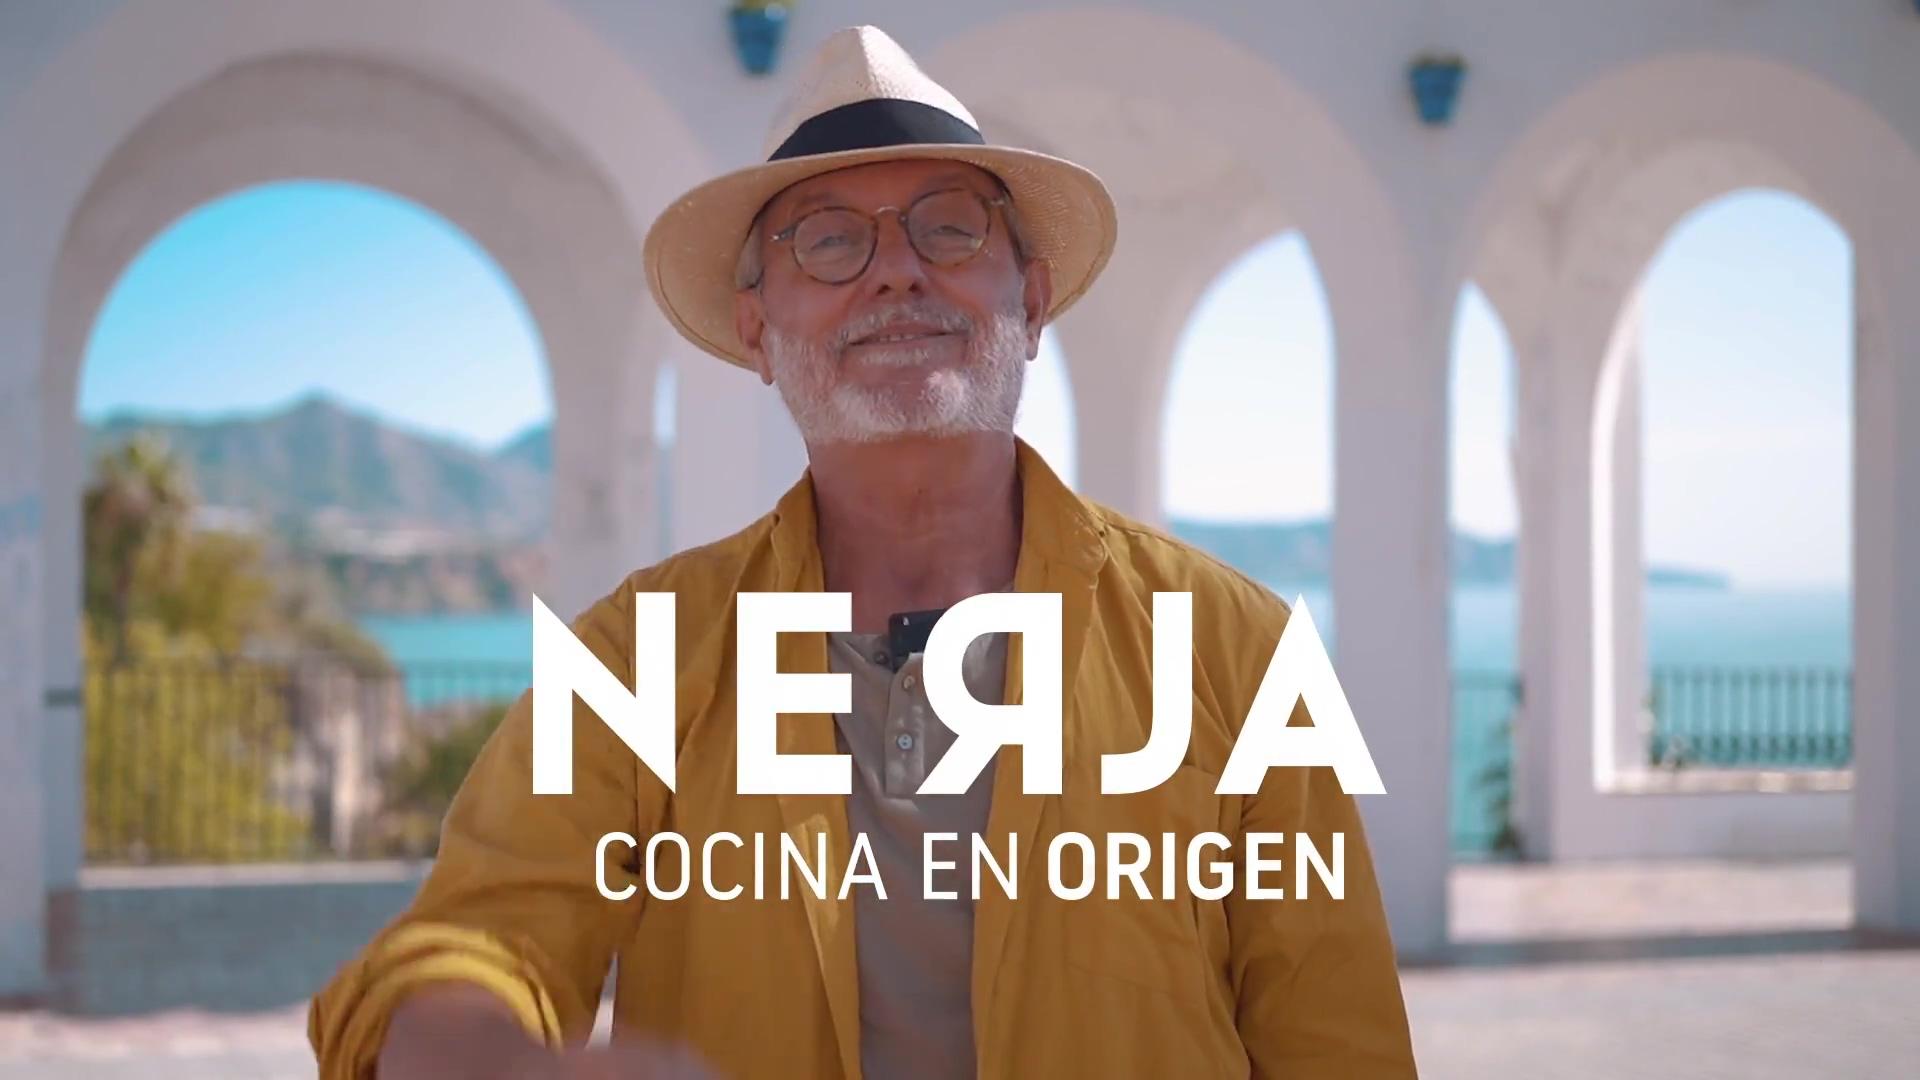 NERJA - MALAGA COCINA EN ORIGEN